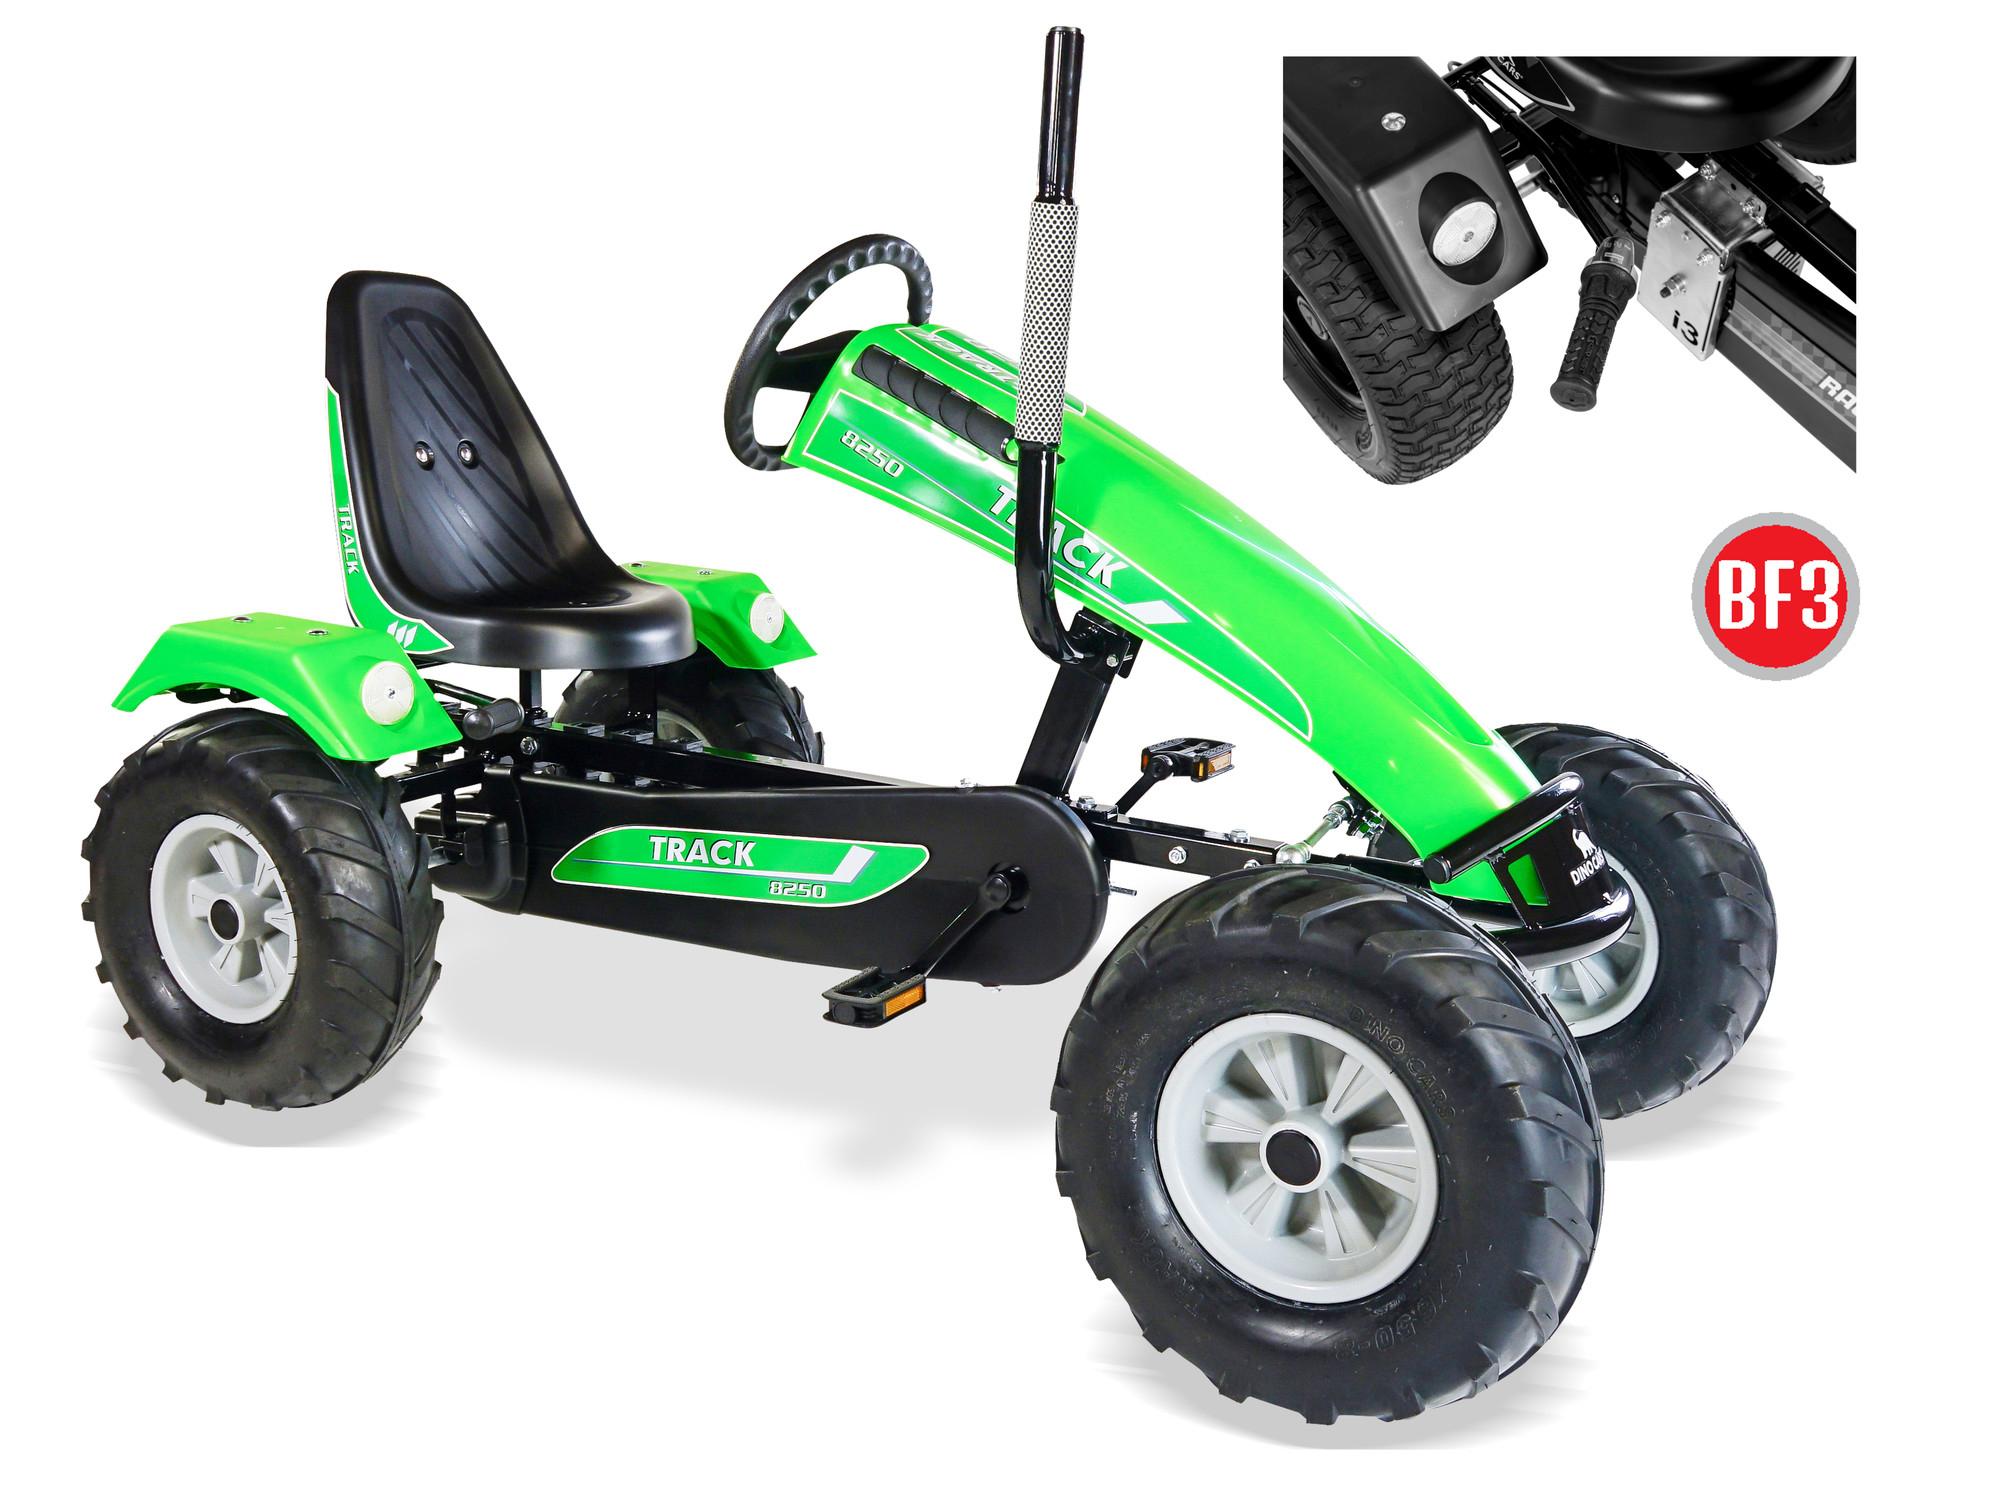 Gokart / Pedal-Gokart Track BF3 grün DINO CARS Bild 1